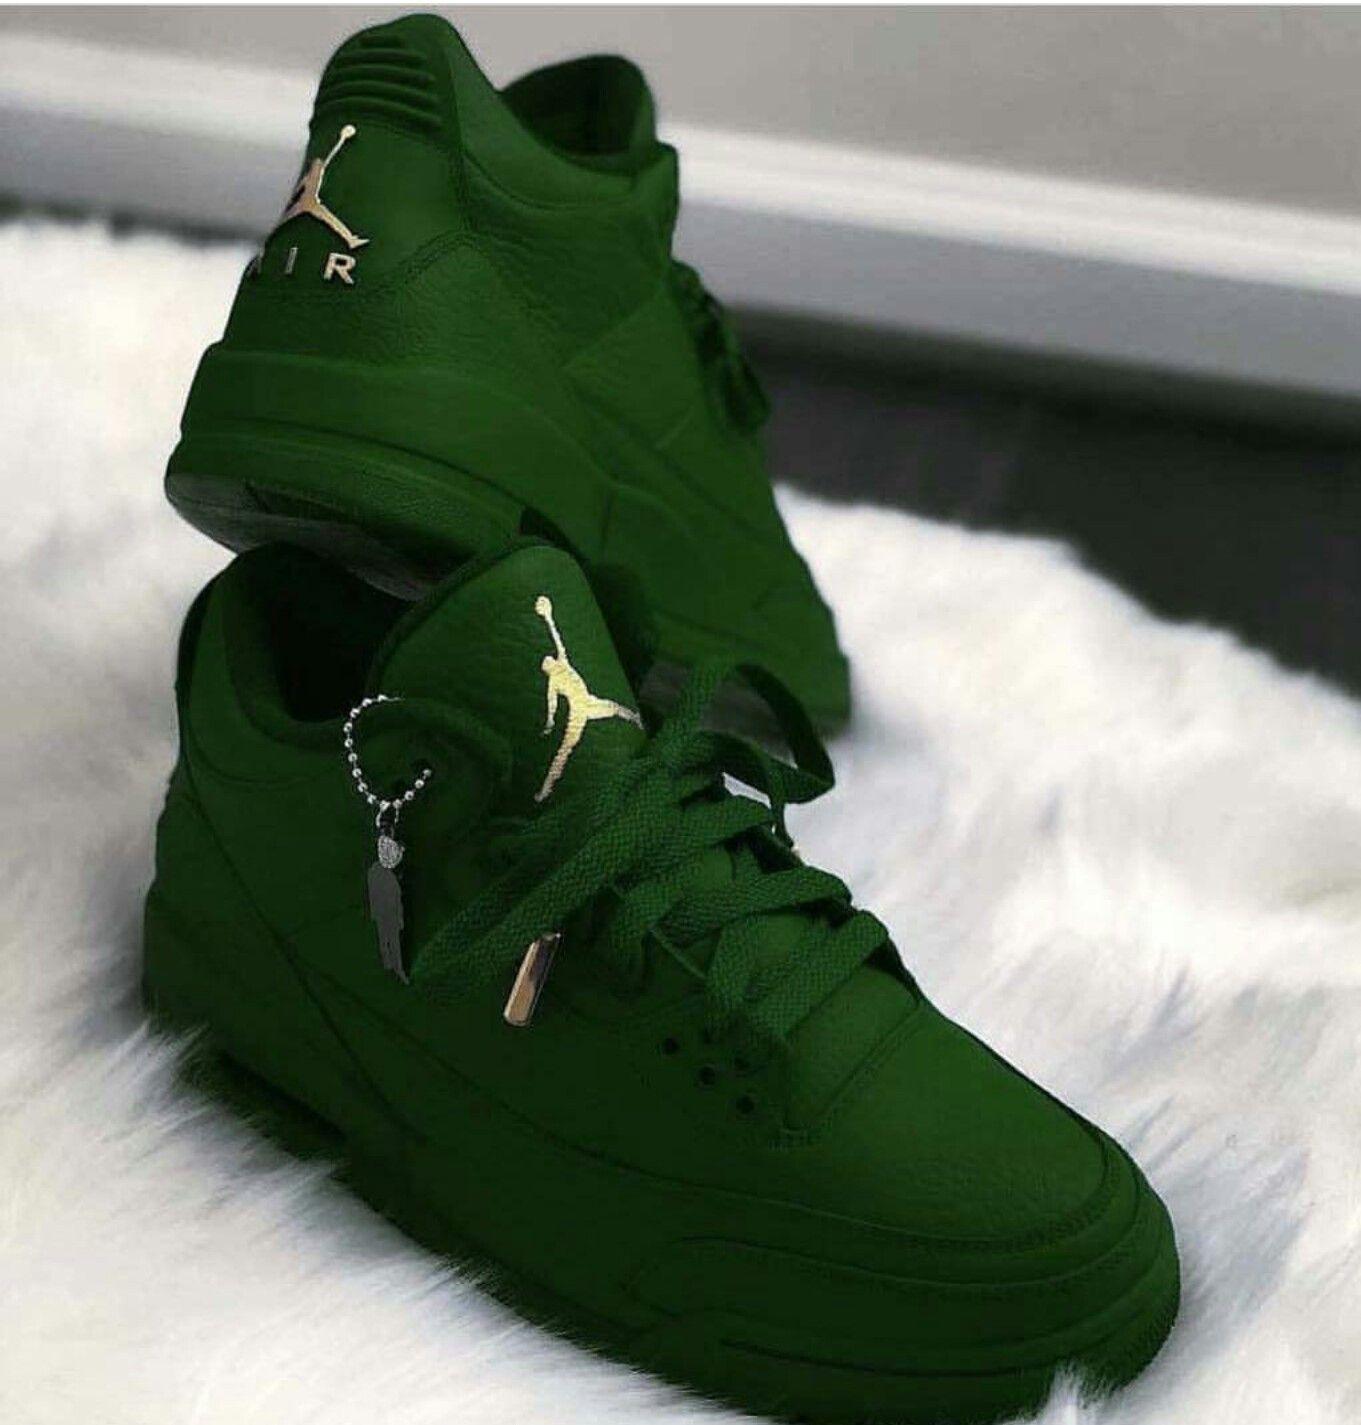 official photos 8d19a 901d1 Quiero estas,, espero respuesta Jordans Sneakers, Green Sneakers, Sneakers  Outfit Nike,